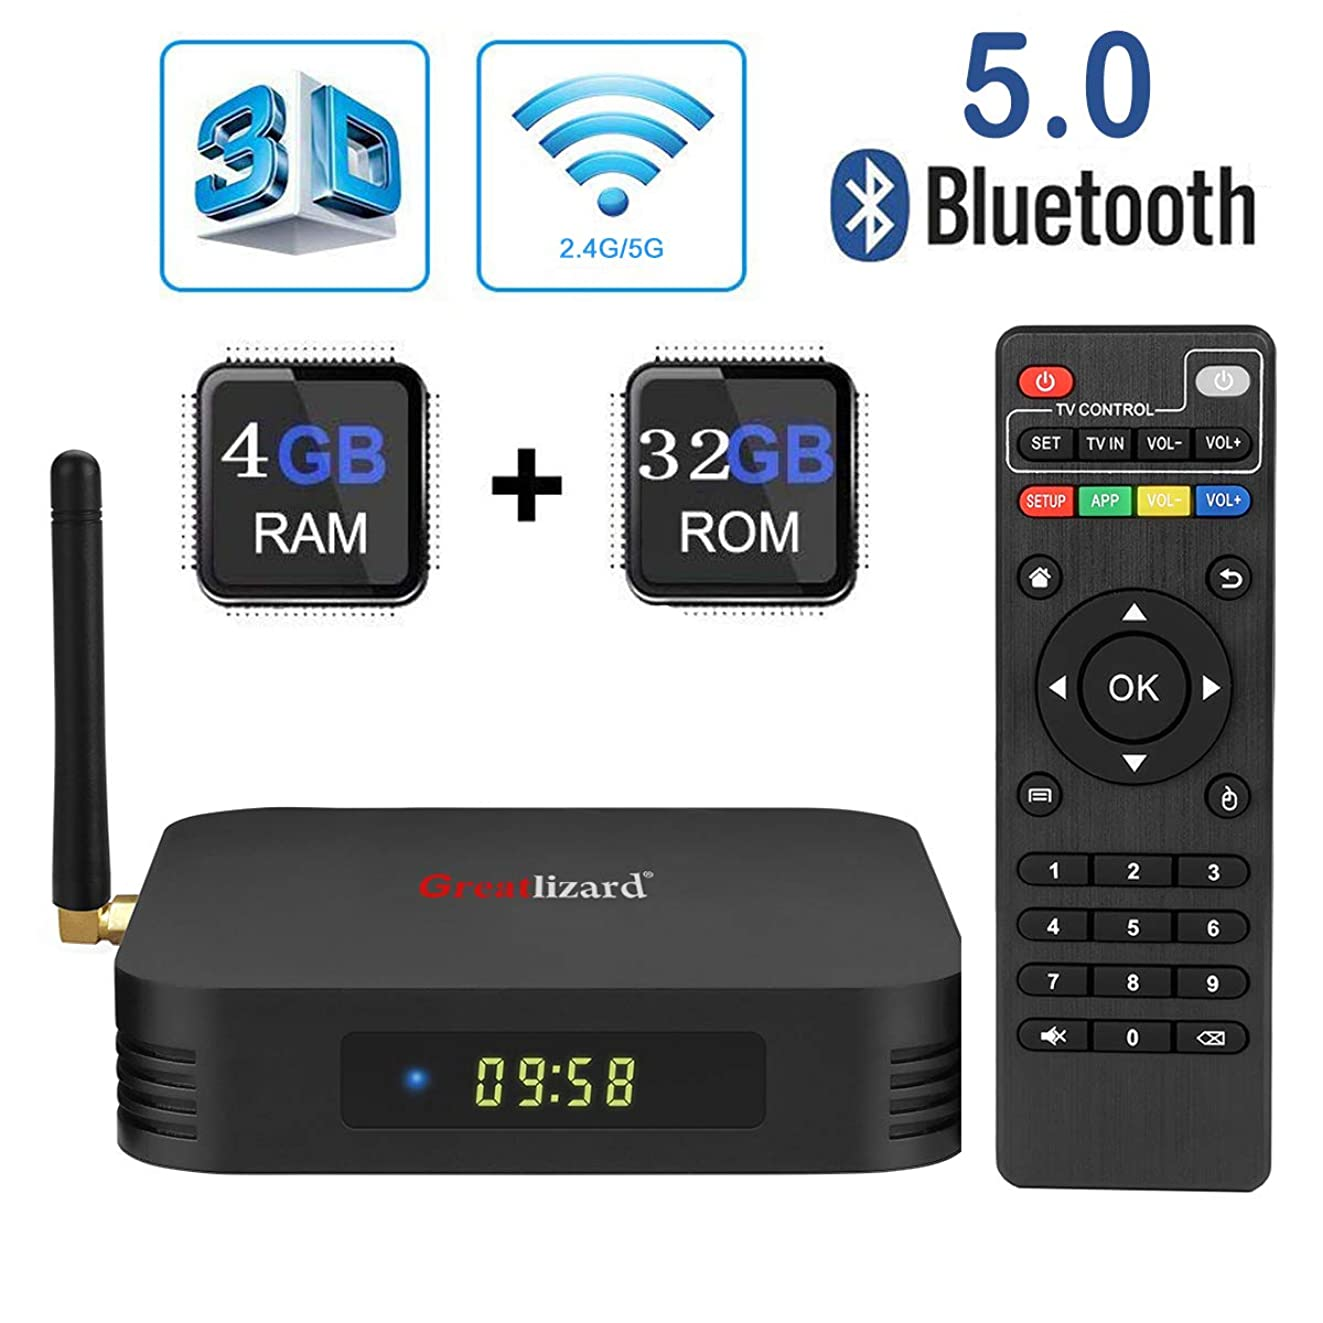 Android 9.0 TV Box,Greatlizard TX6 Android Box 4GB DDR3 32GB ROM BT5.0 Dual WiFi 2.4G+5G Quad Core 1080p 4K 6K USB 3.0 HDR Smart TV Media Box